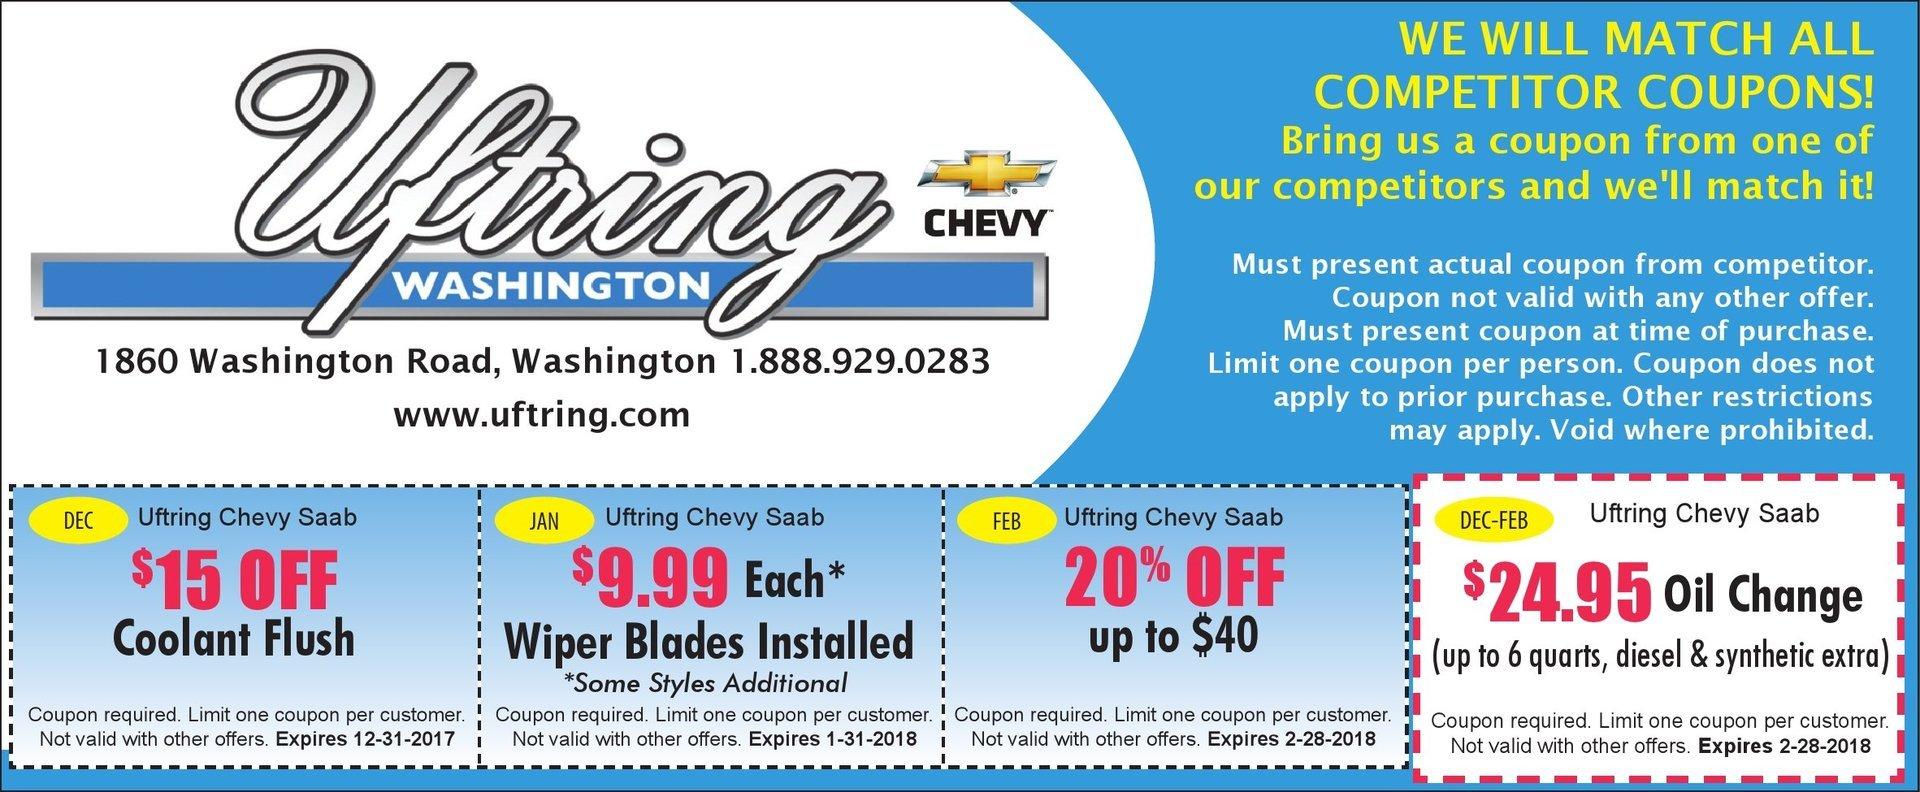 Uftring Chevy Washington $15 off coolant flush, $9.99 wiper blades, 20% off service, oil change $24.95 coupons Washington, IL